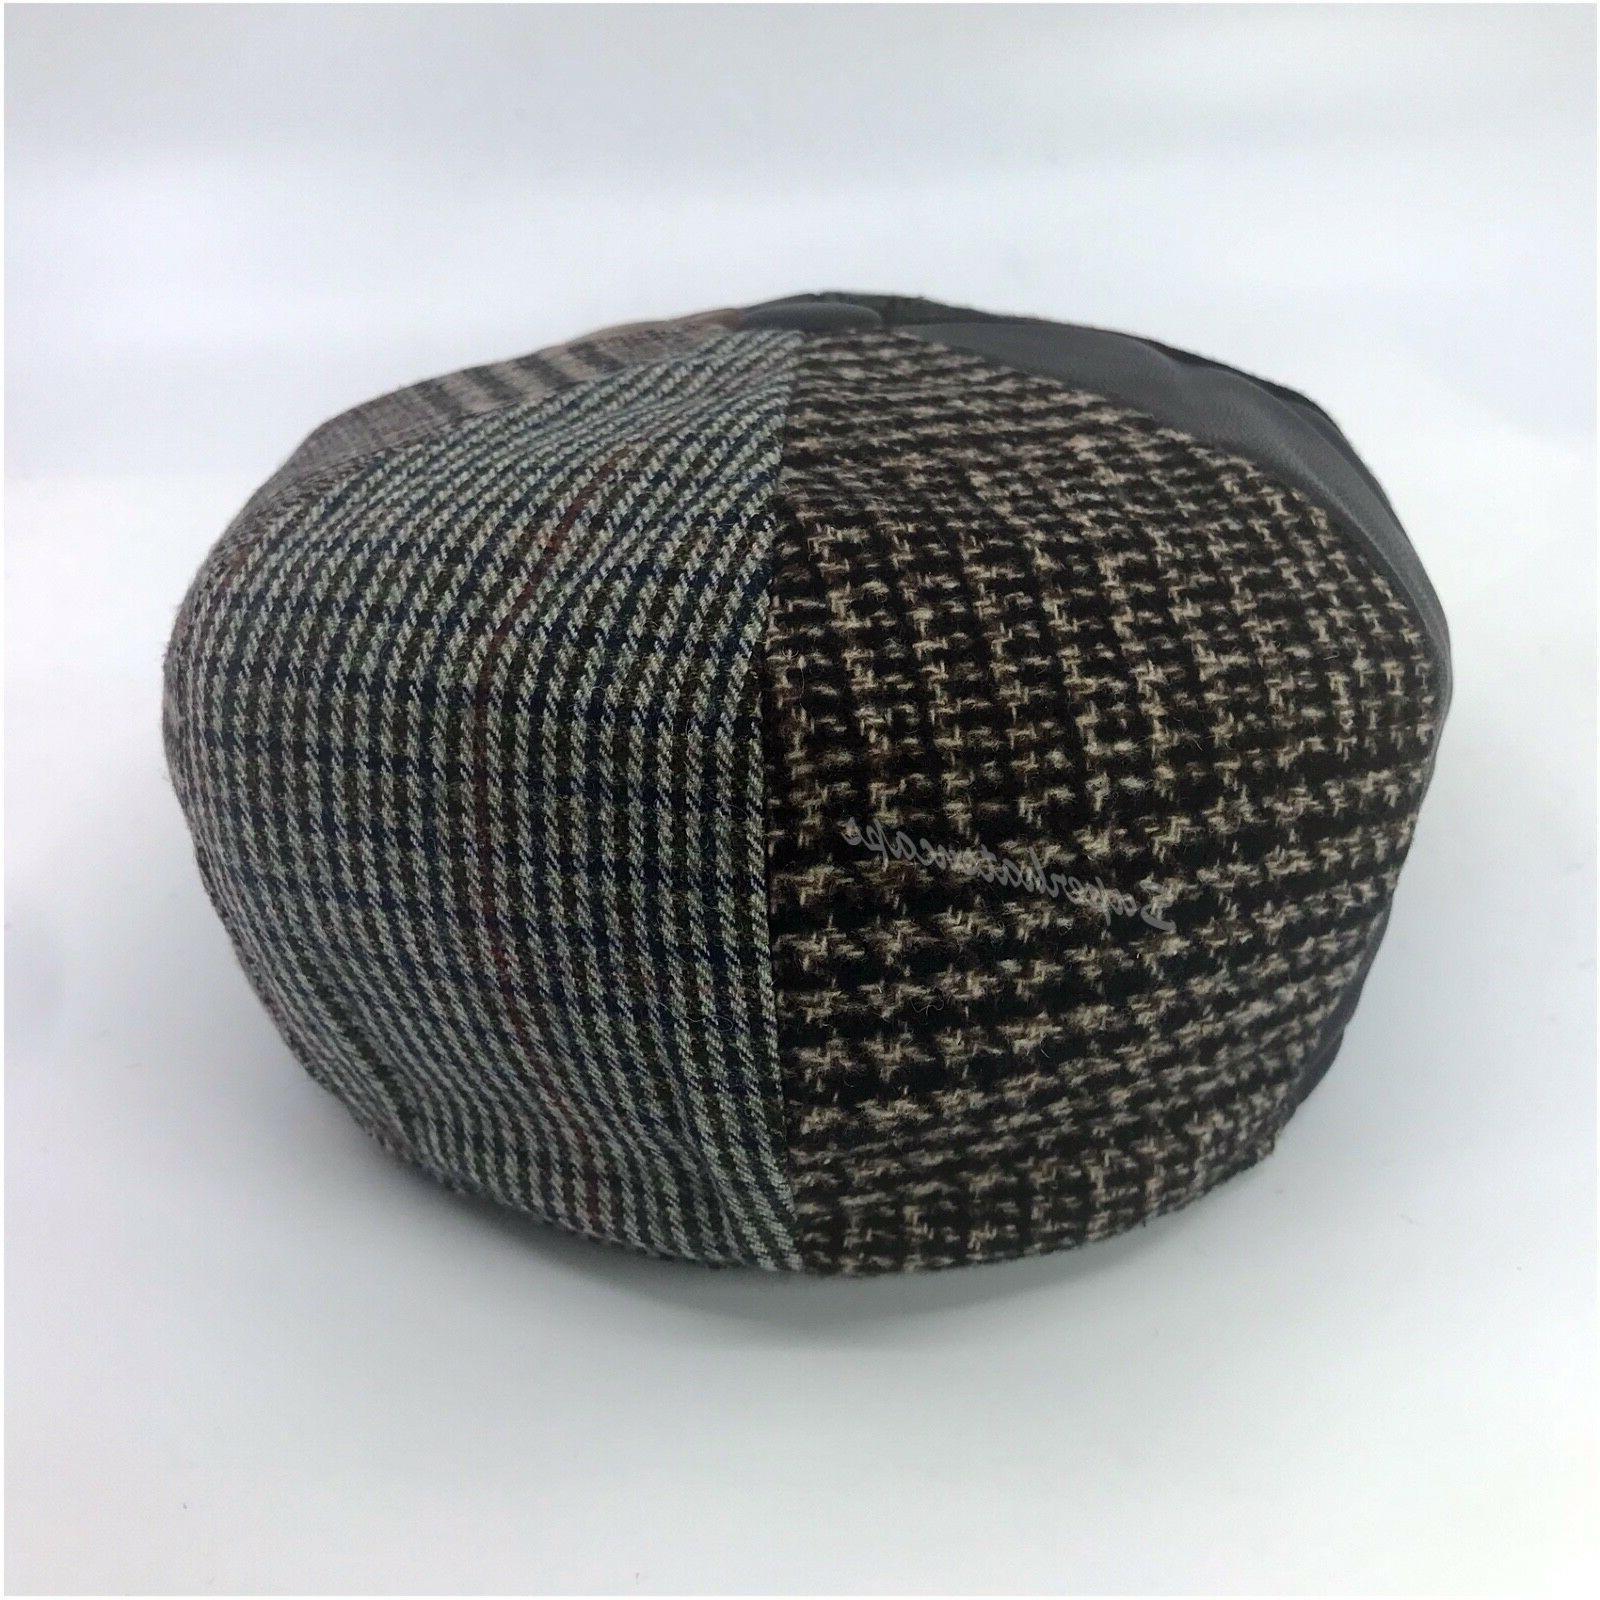 Men's Cabbie Newsboy Jack Ascot Plaid Patch Wool Hat